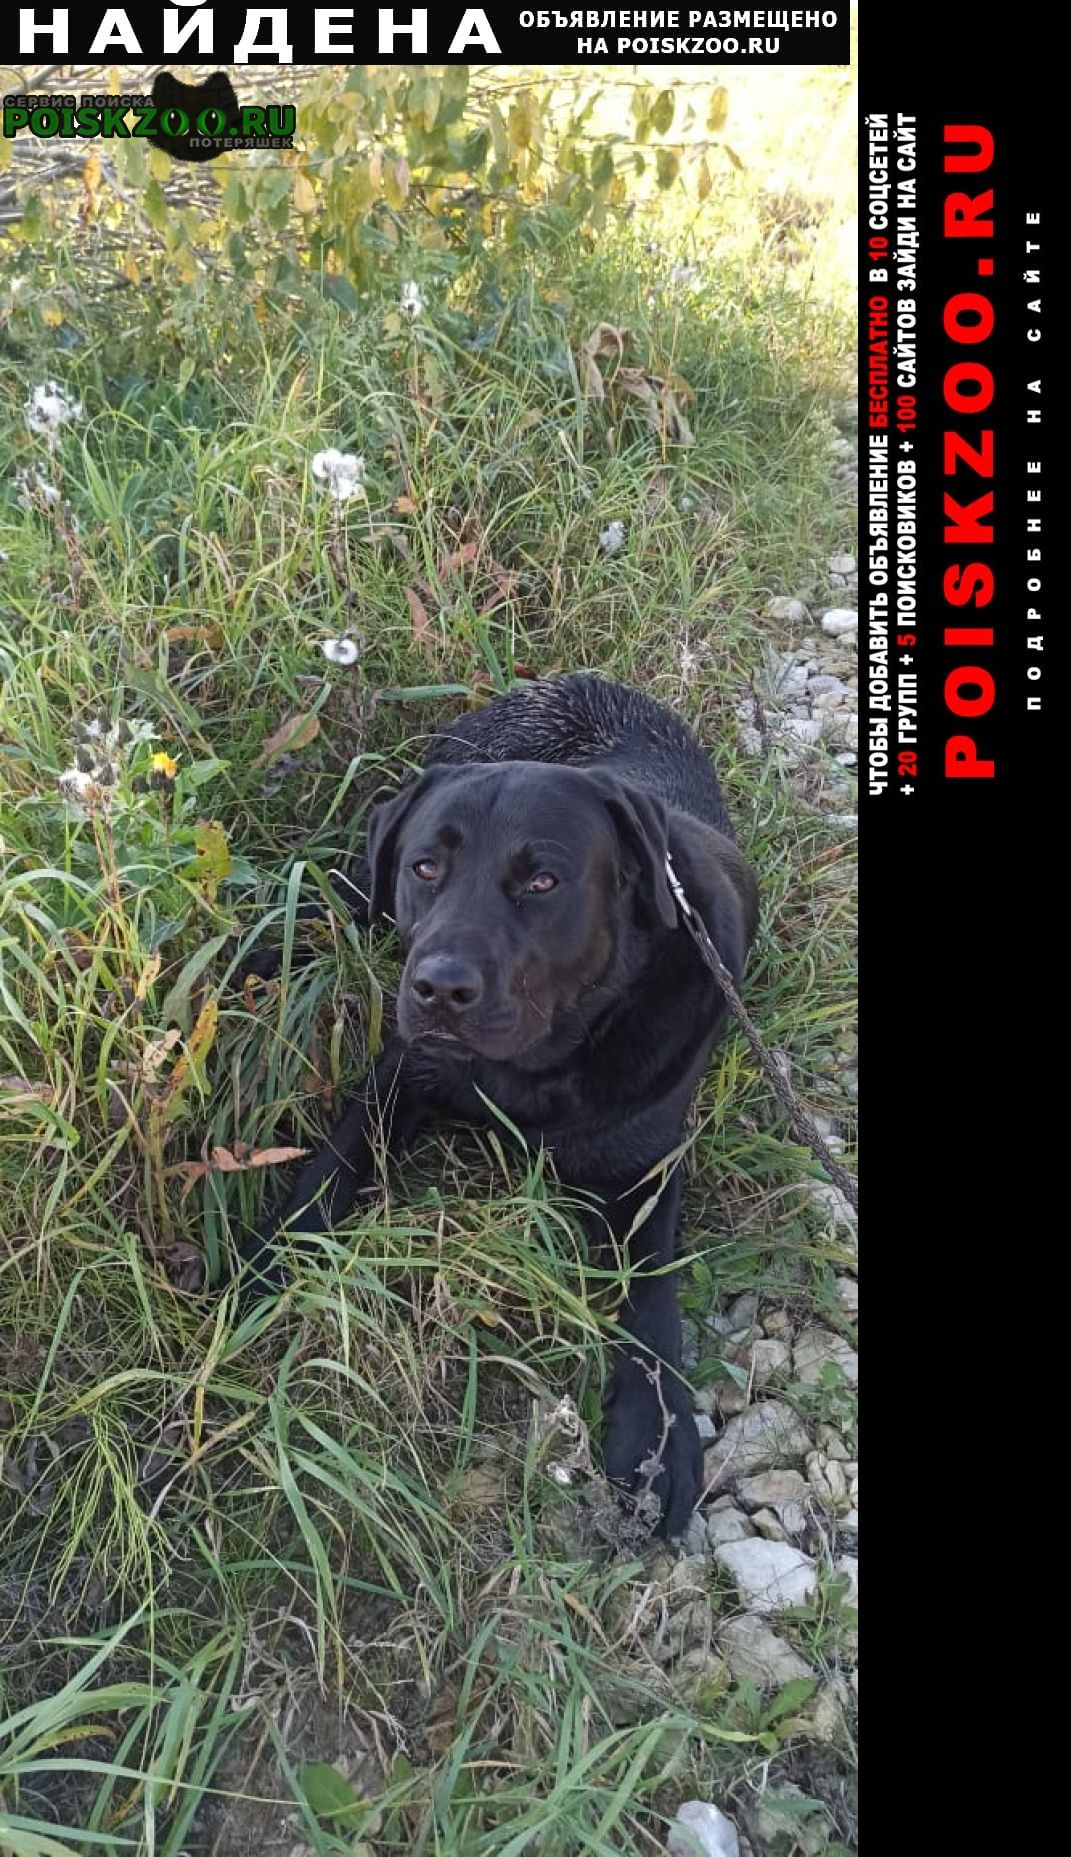 Шатура Найдена собака